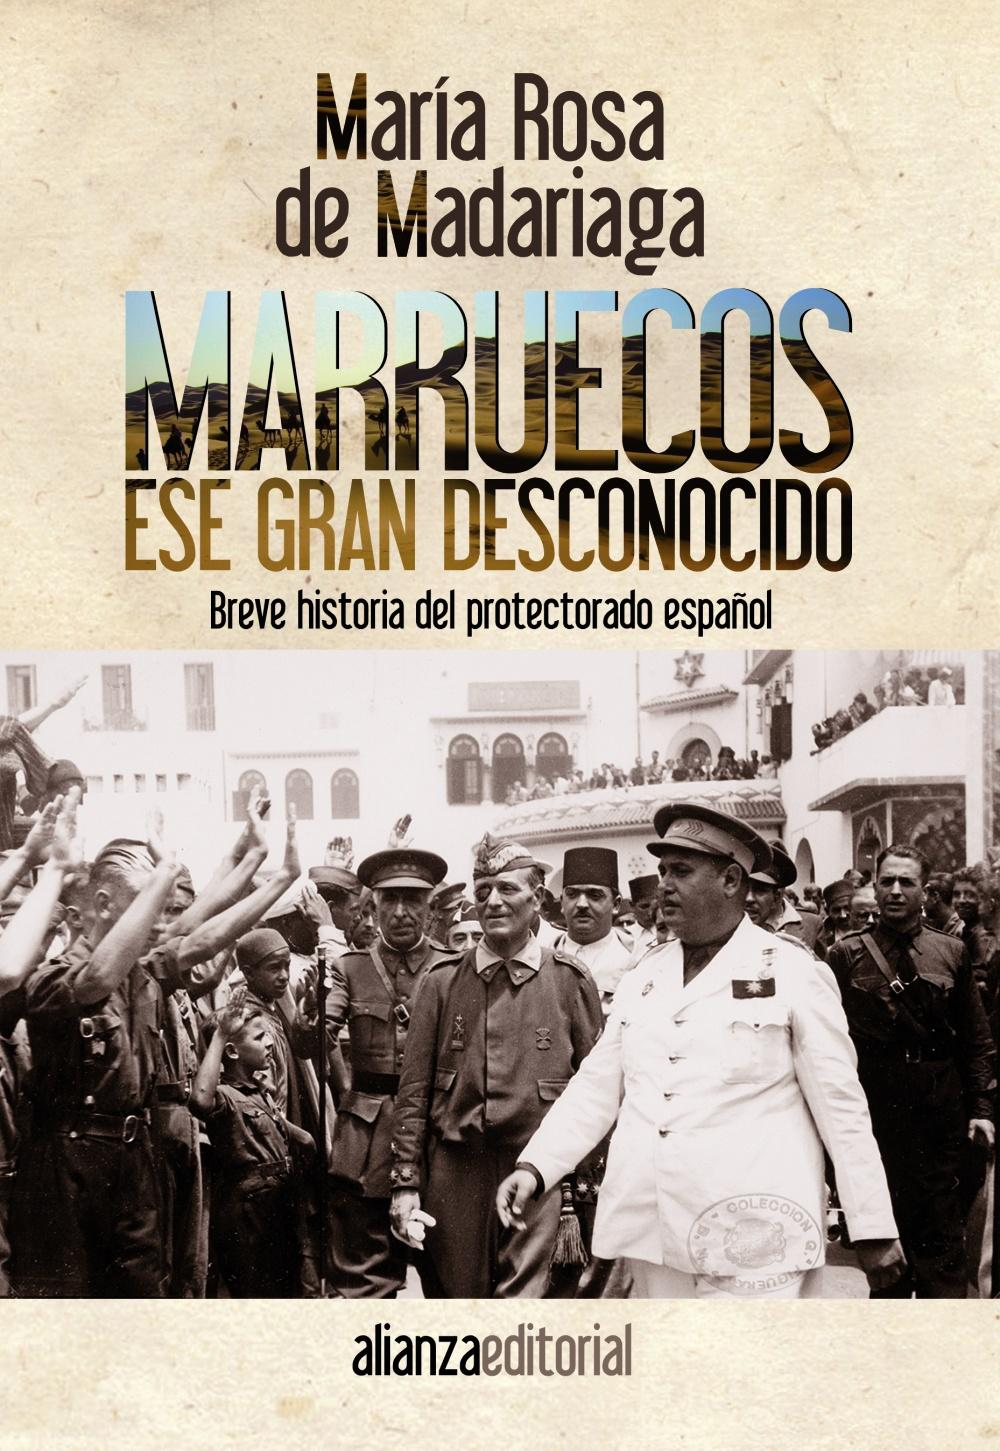 María Rosa de Madariaga: MARRUECOS, ESE GRAN DESCONOCIDO.